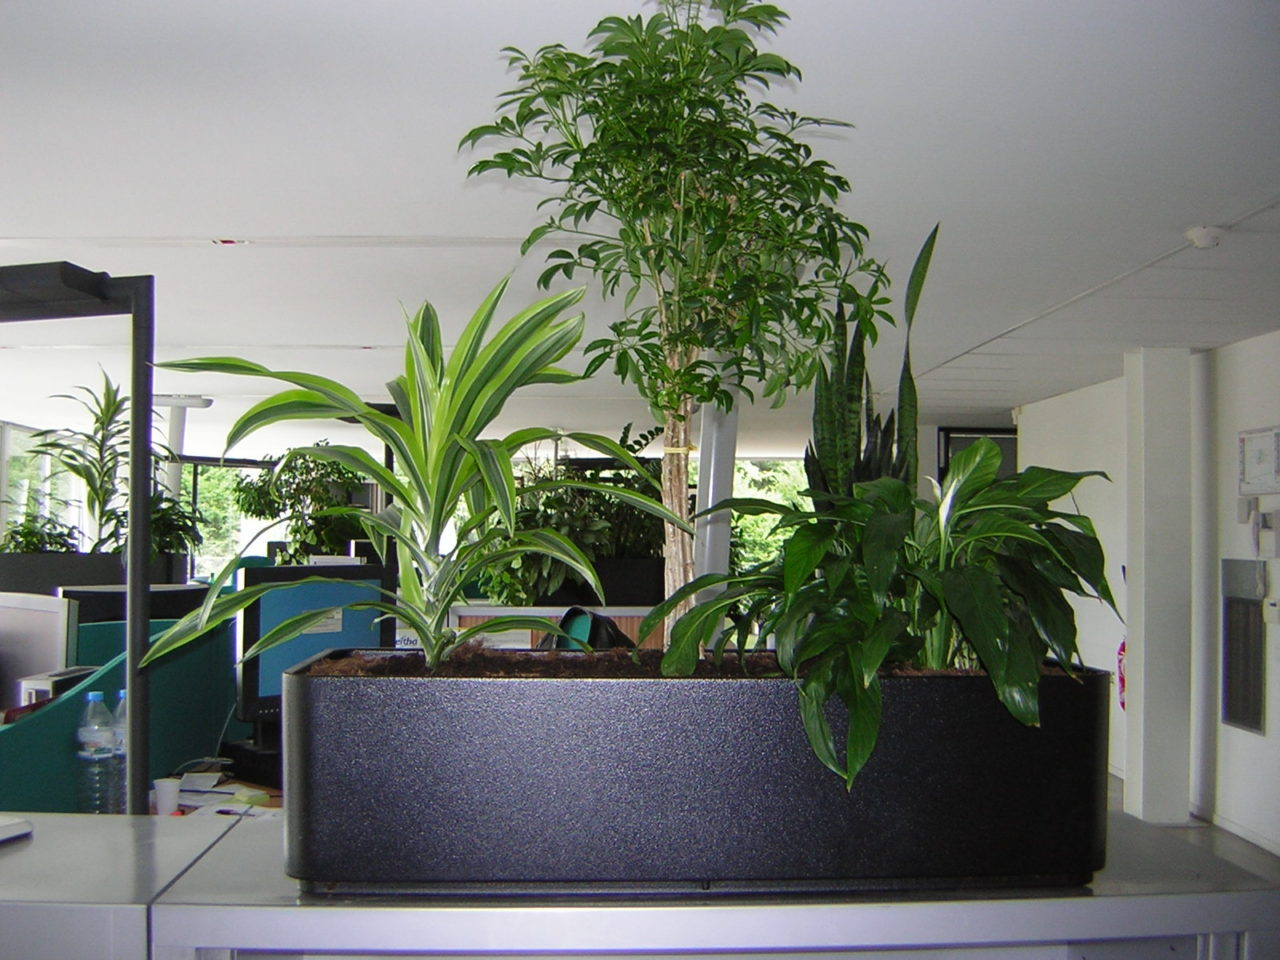 https://www.vert-morisson.fr/wp-content/uploads/2021/05/separateur-openspace-plantesvertes-contenants-united.jpg-1280x960.jpg